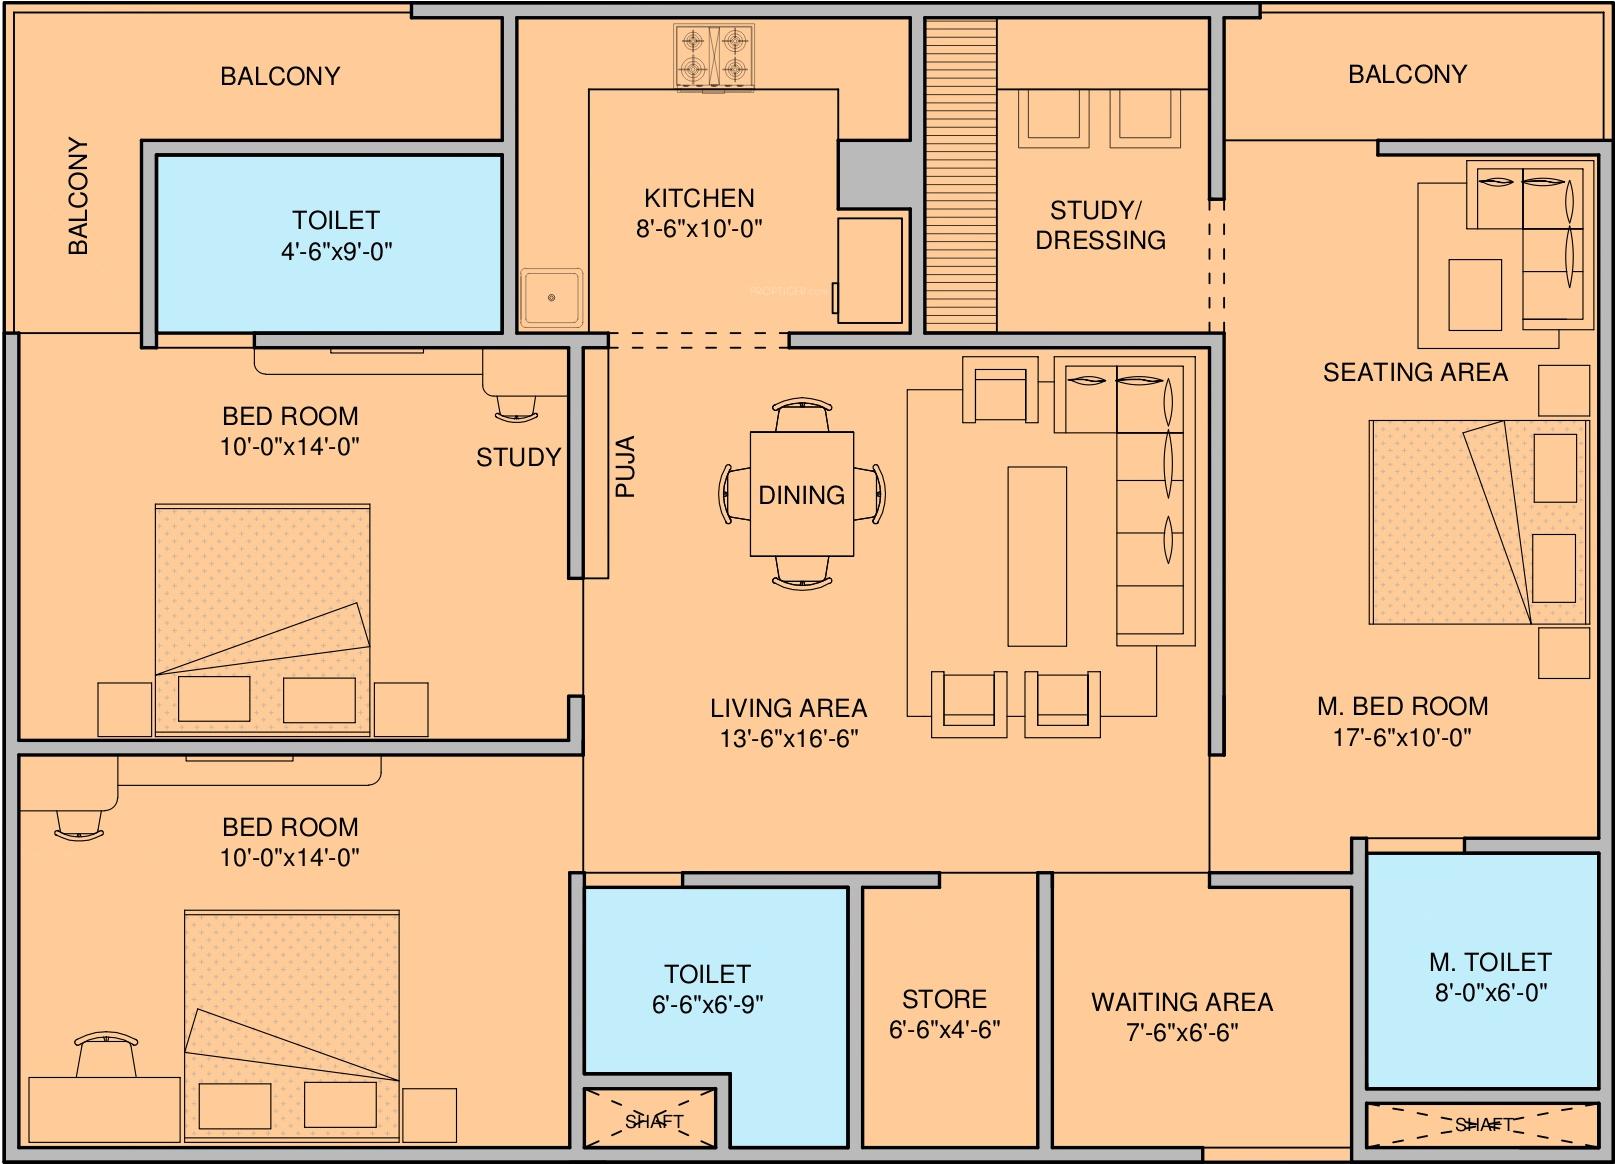 floor plan 1bhk 1t 450 sq ft free home design ideas images 450 sq ft 2 bhk floor plan image deswal shivalik springs